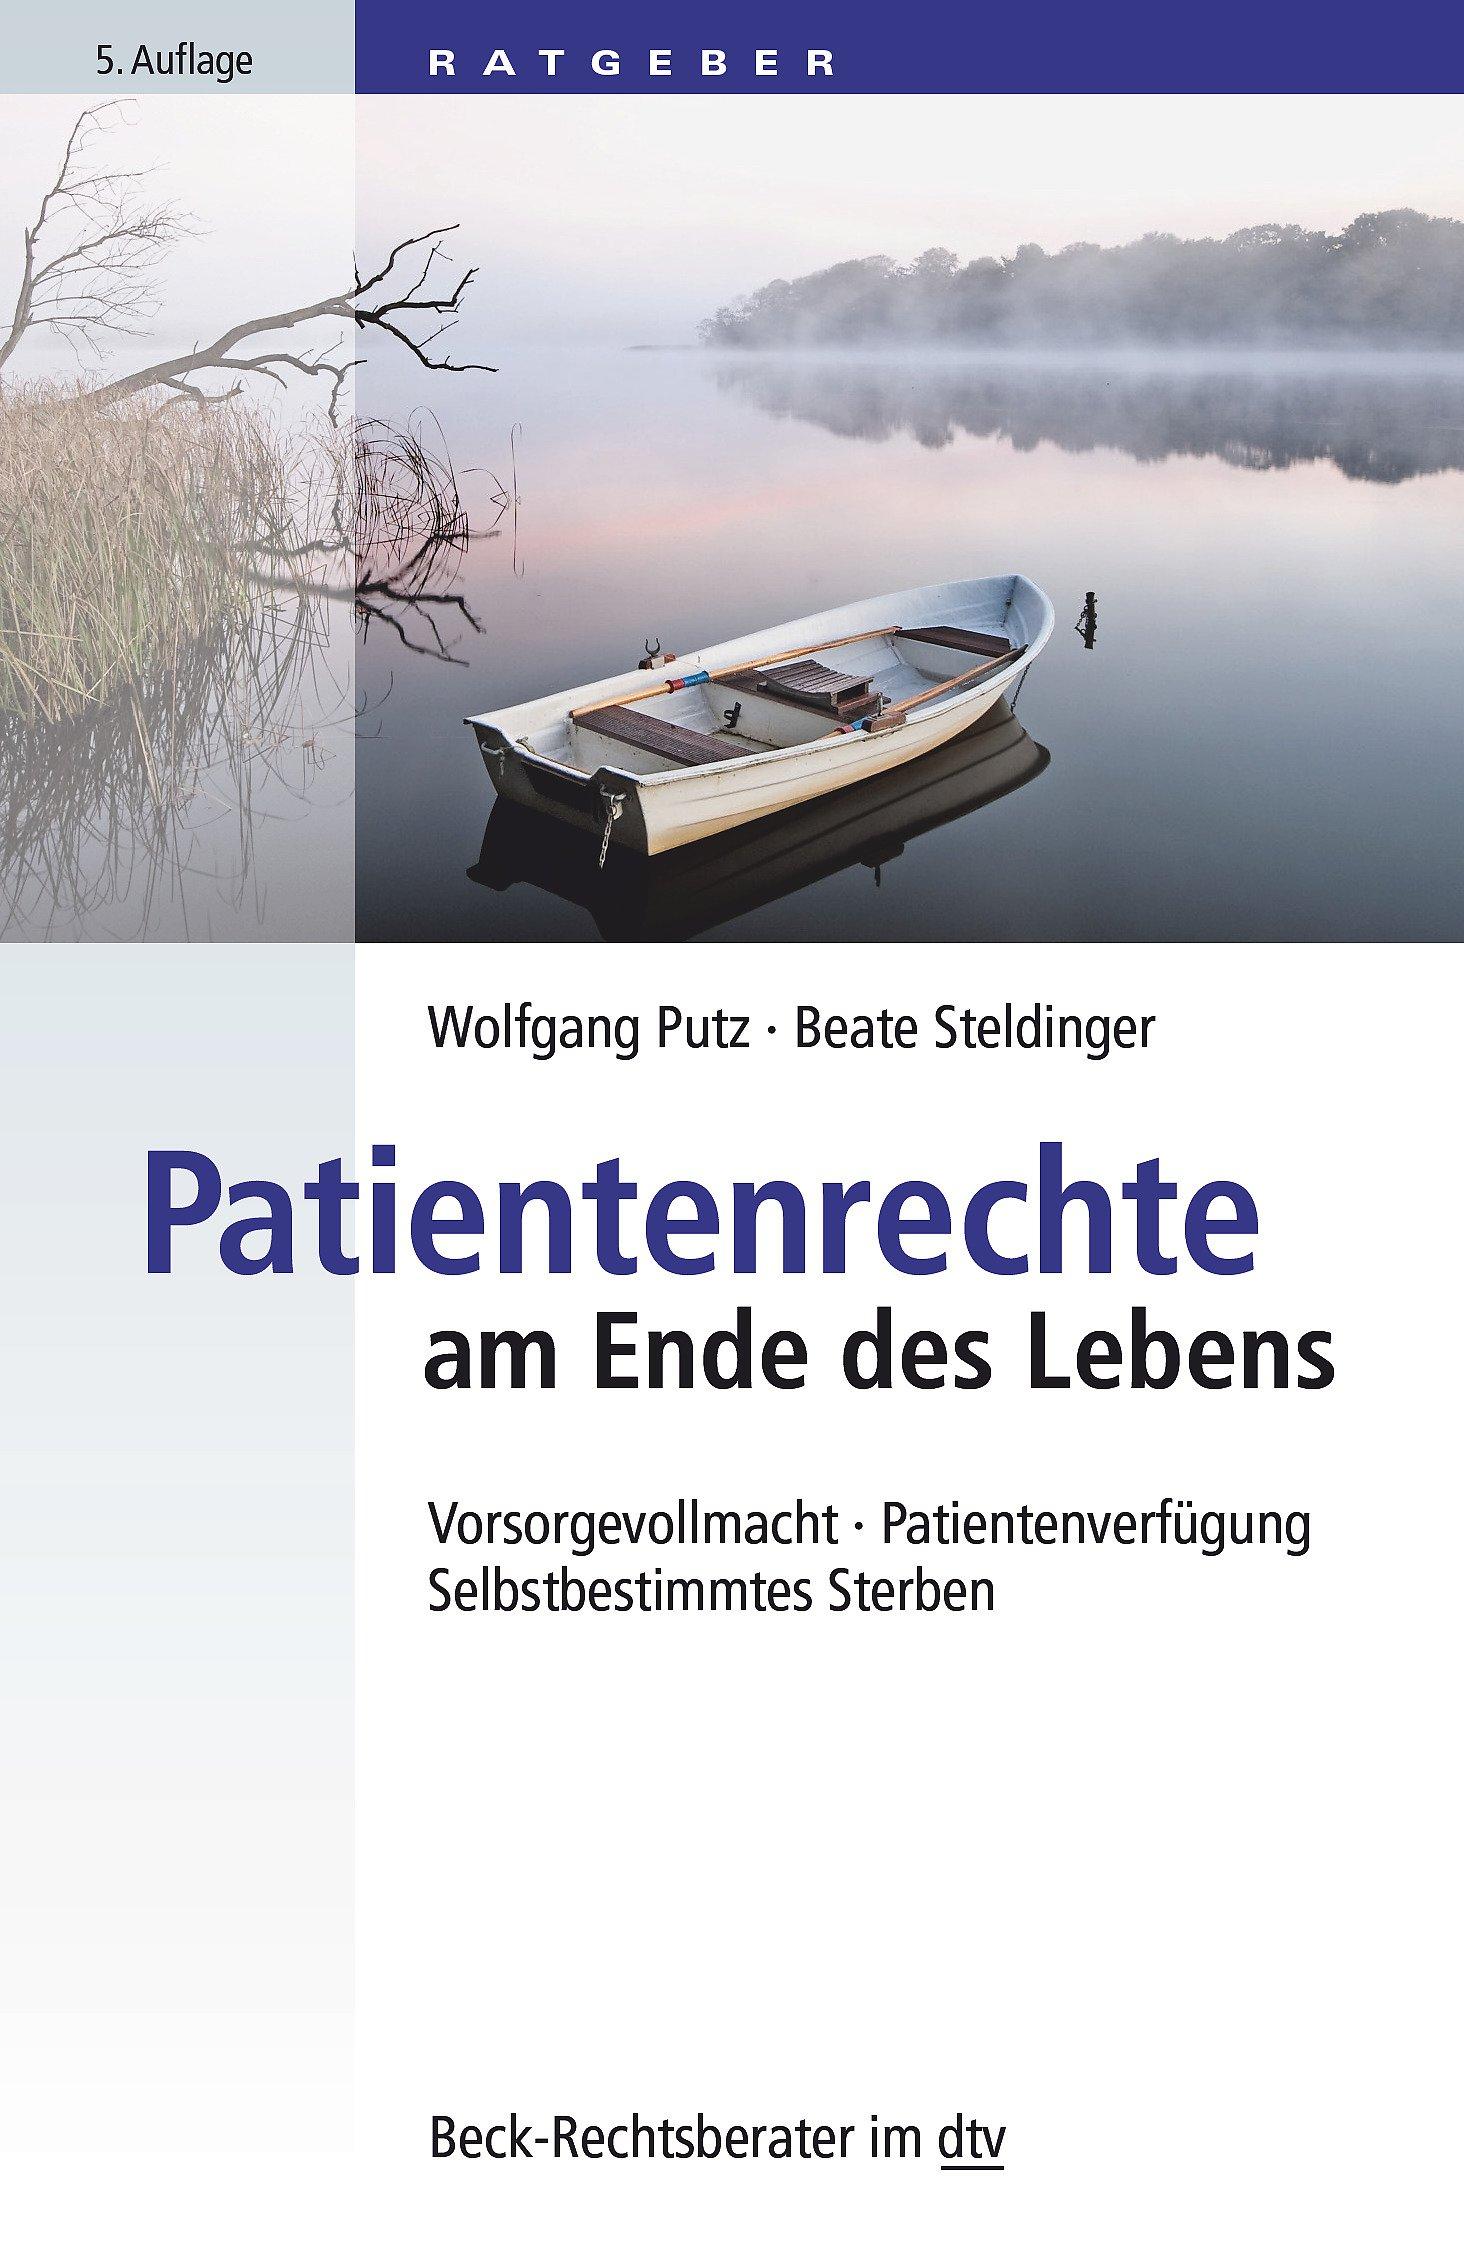 patientenrechte-am-ende-des-lebens-vorsorgevollmacht-patientenverfgung-selbstbestimmtes-sterben-dtv-beck-rechtsberater